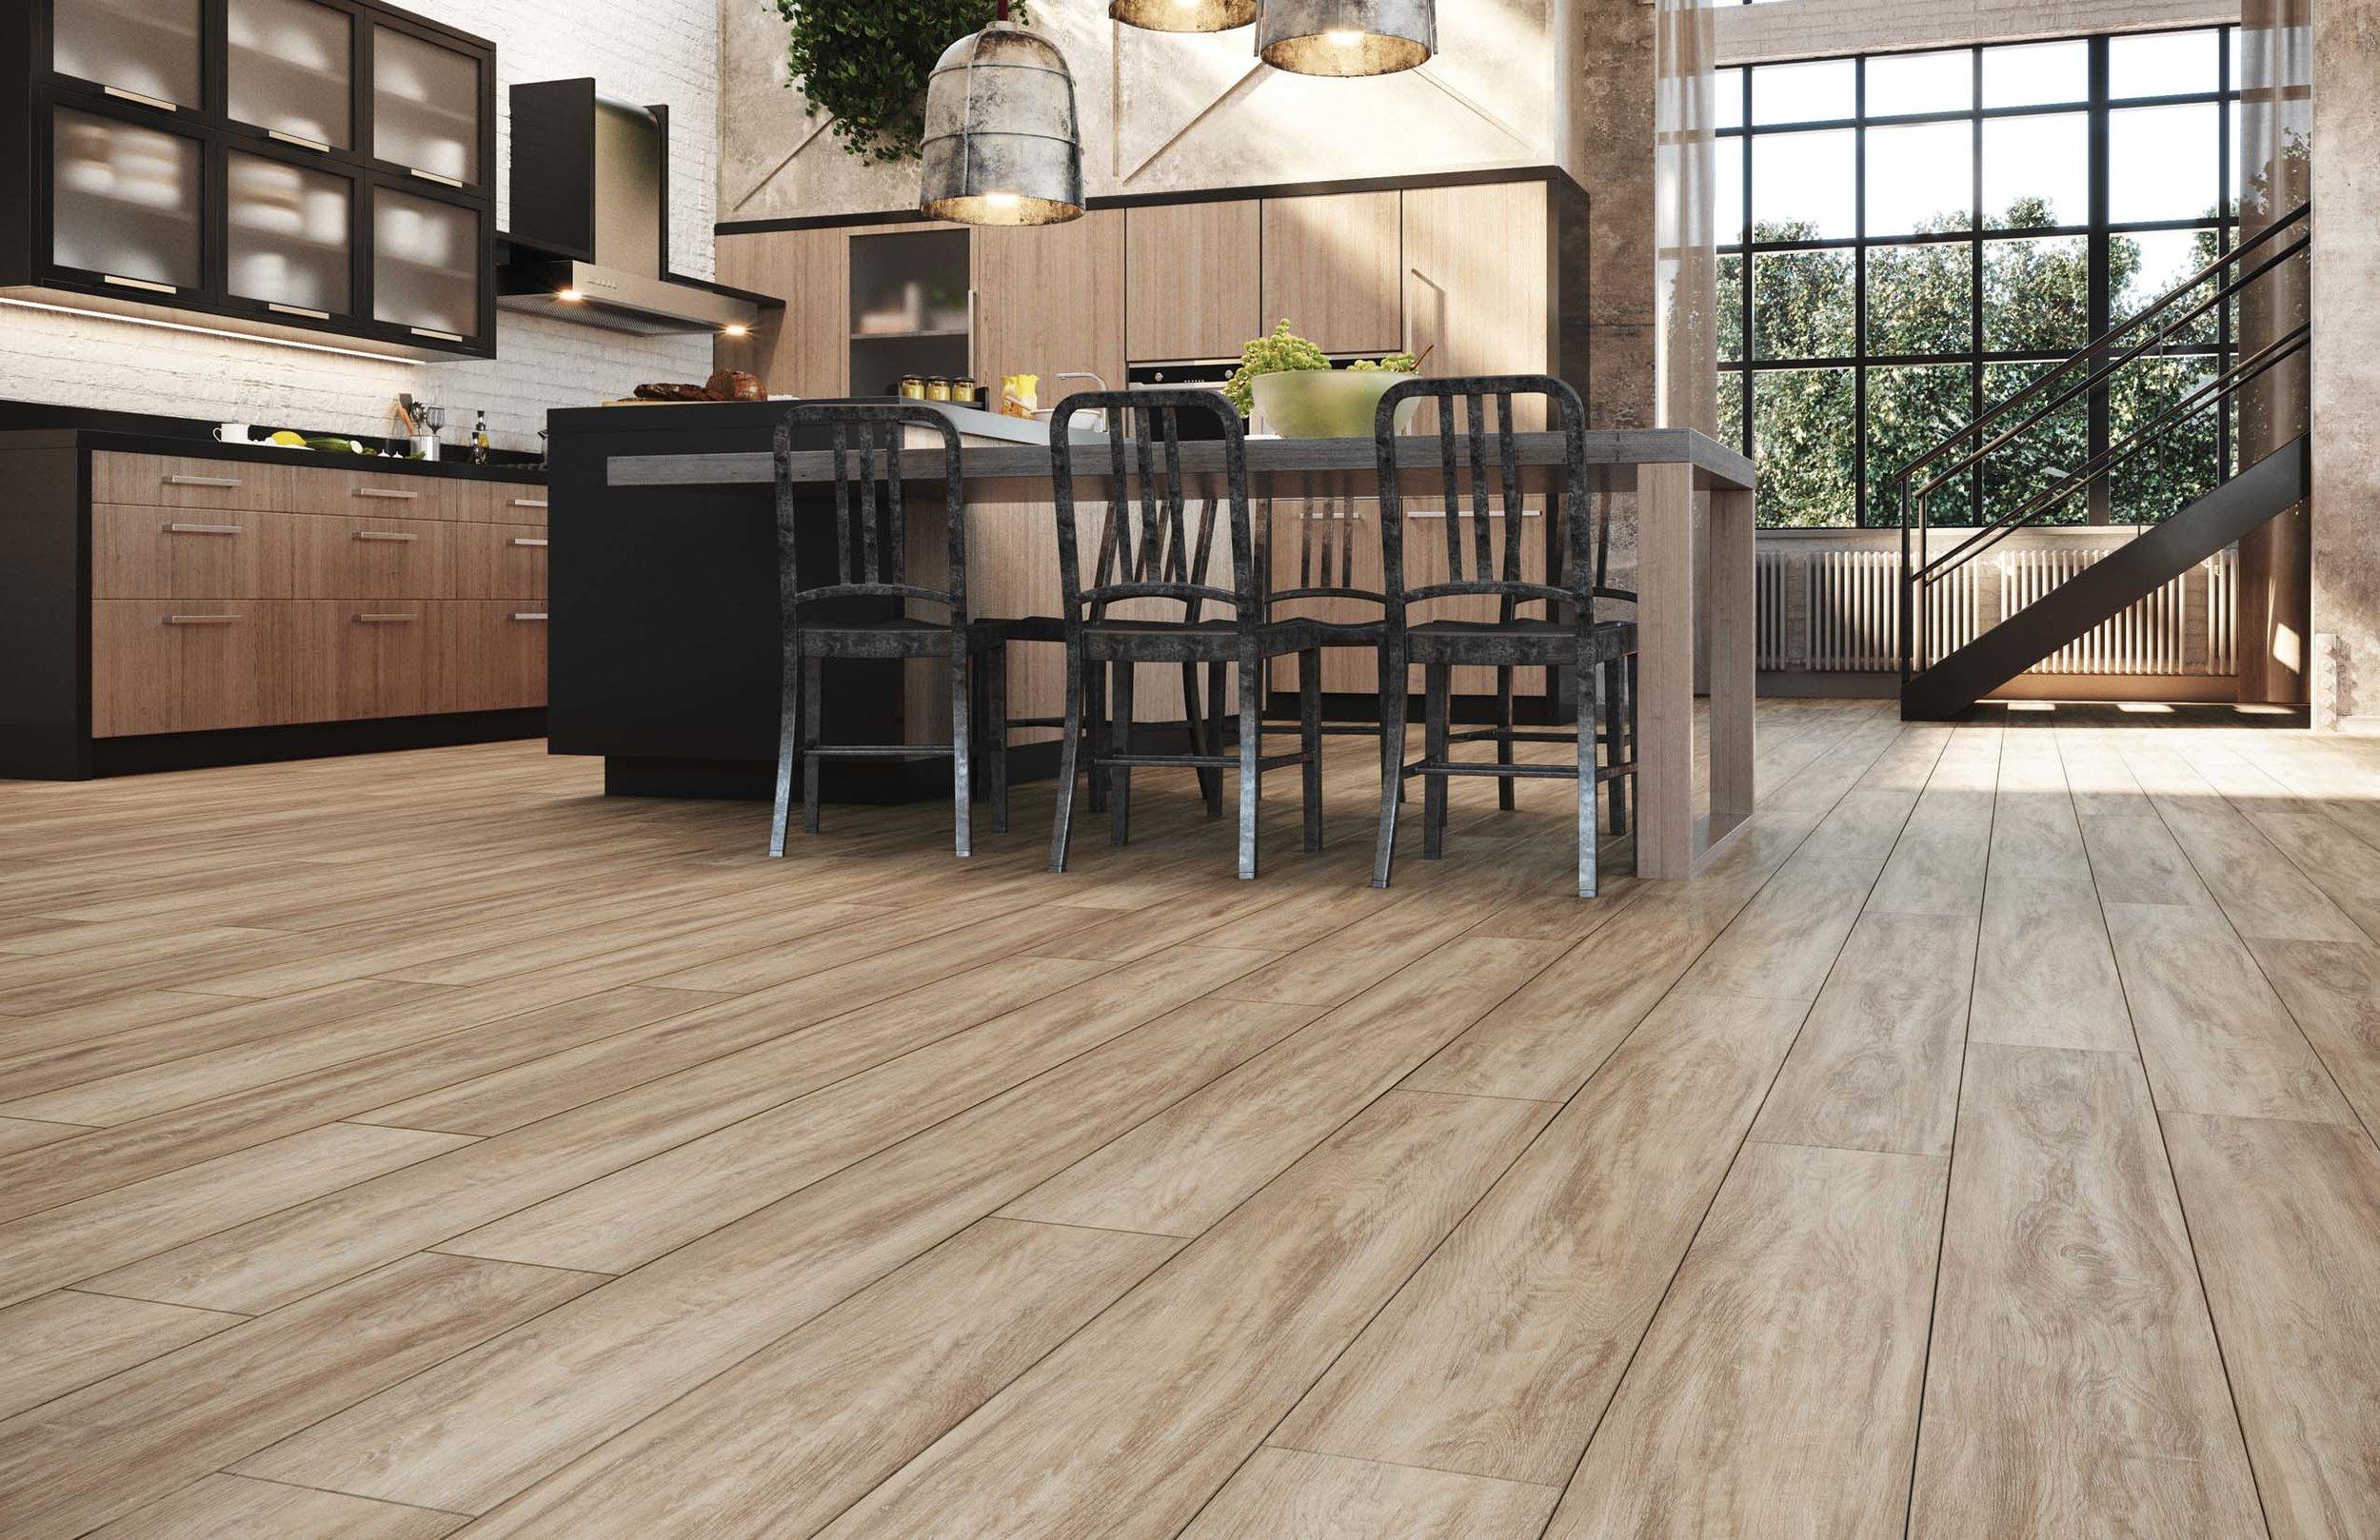 Rigidwood Elite Abbey 2 97 Sale Price Boardwalk Hardwood Floors